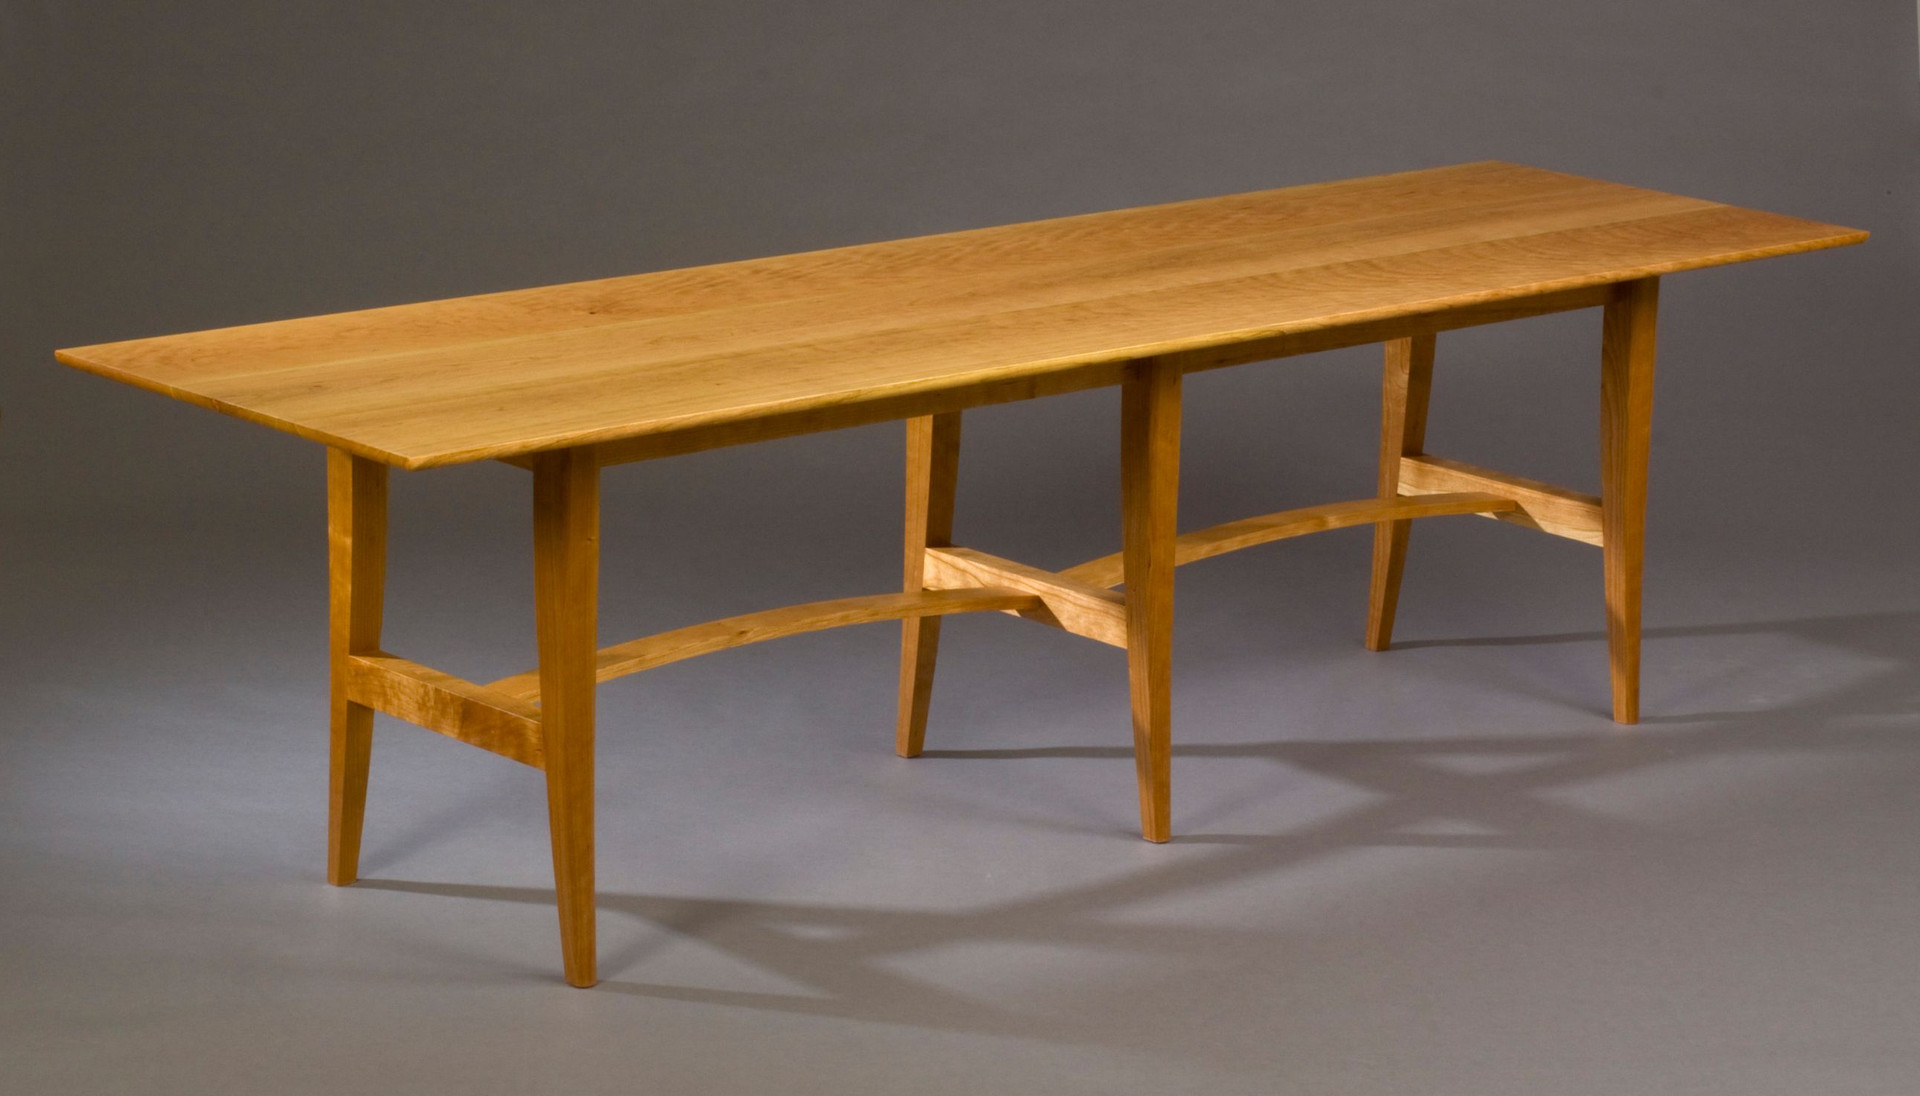 wix_cherry_dining_table (6).jpg